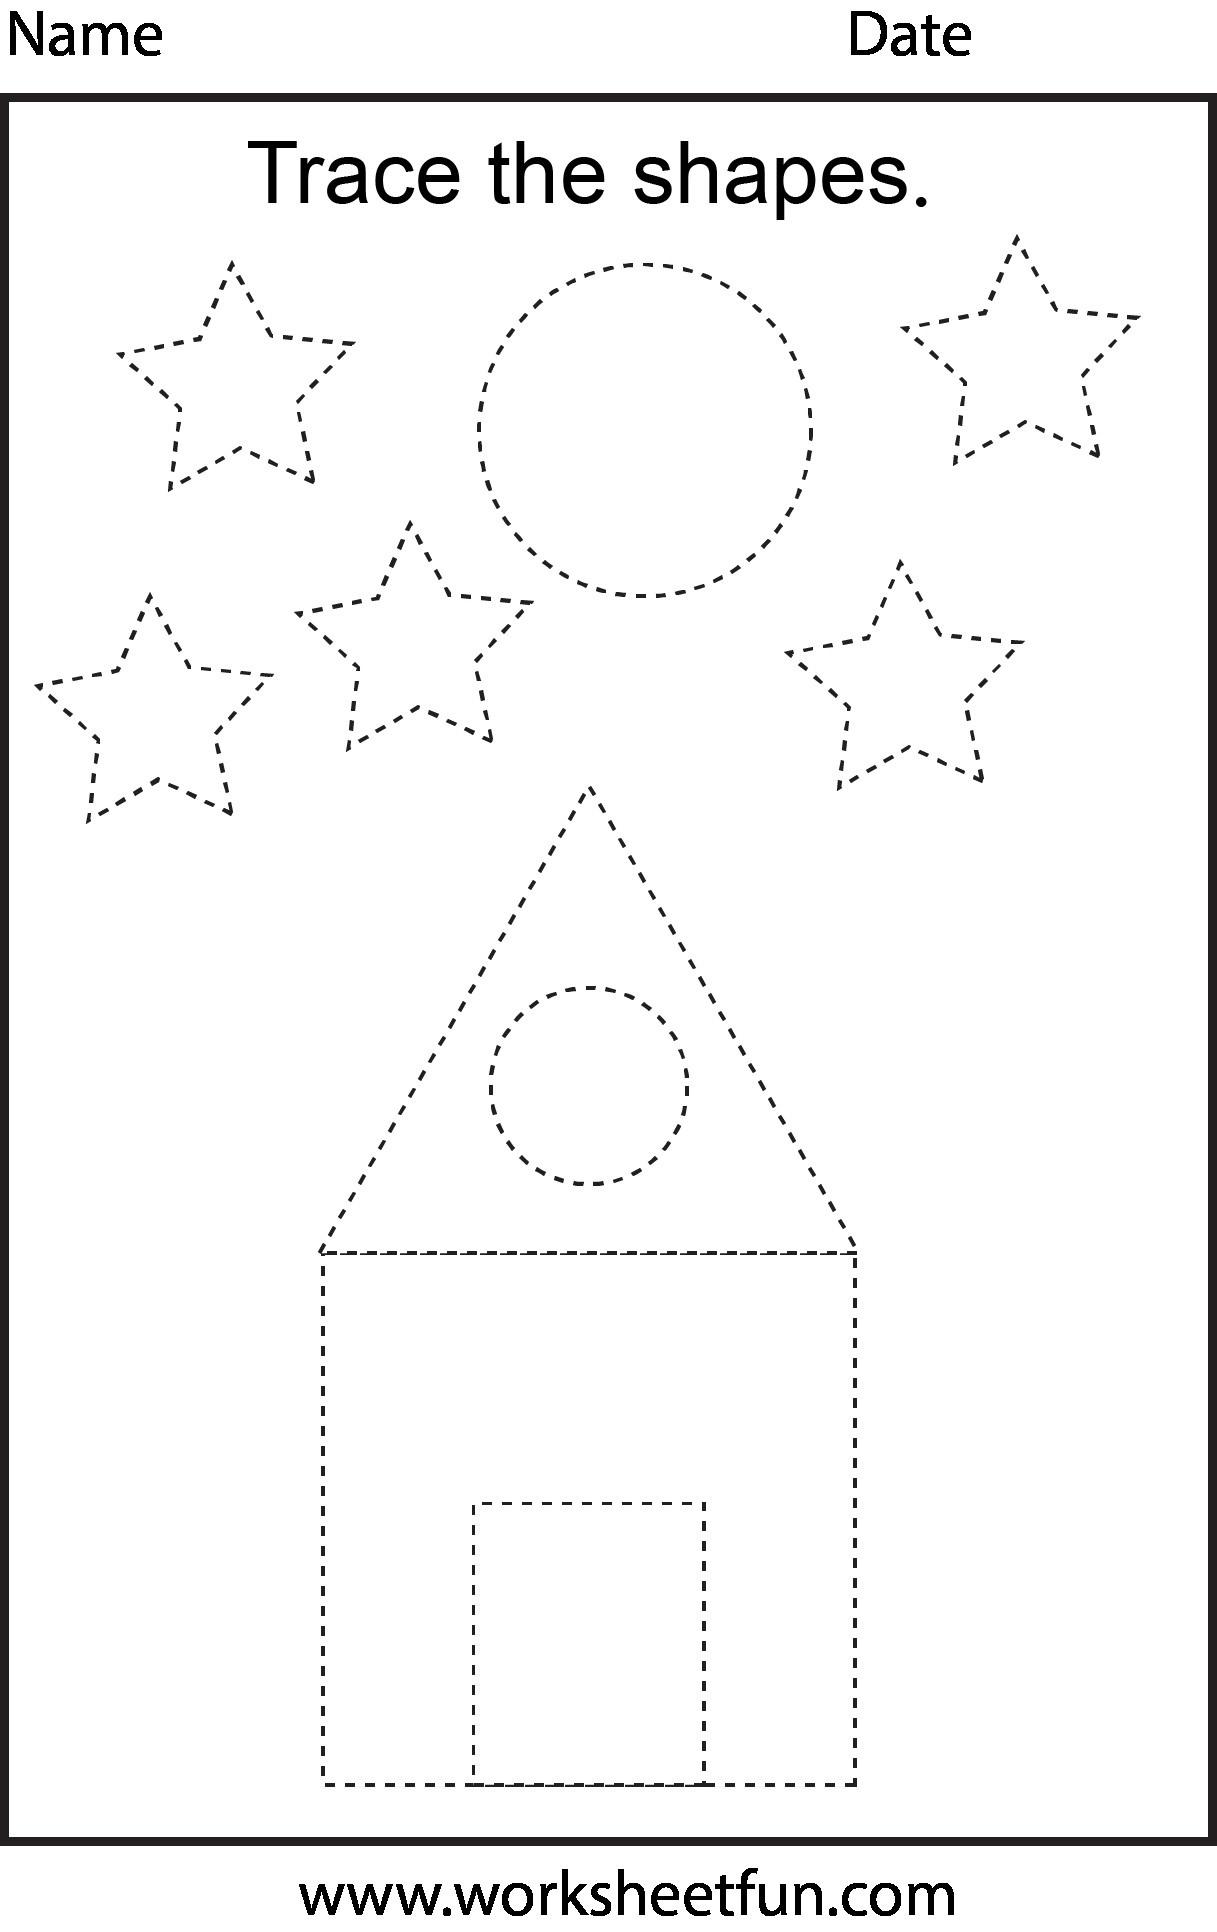 Kindergarten: Christmas Carol Lyrics Printable Can Read Beginning - Free Printable Christmas Books For Kindergarten